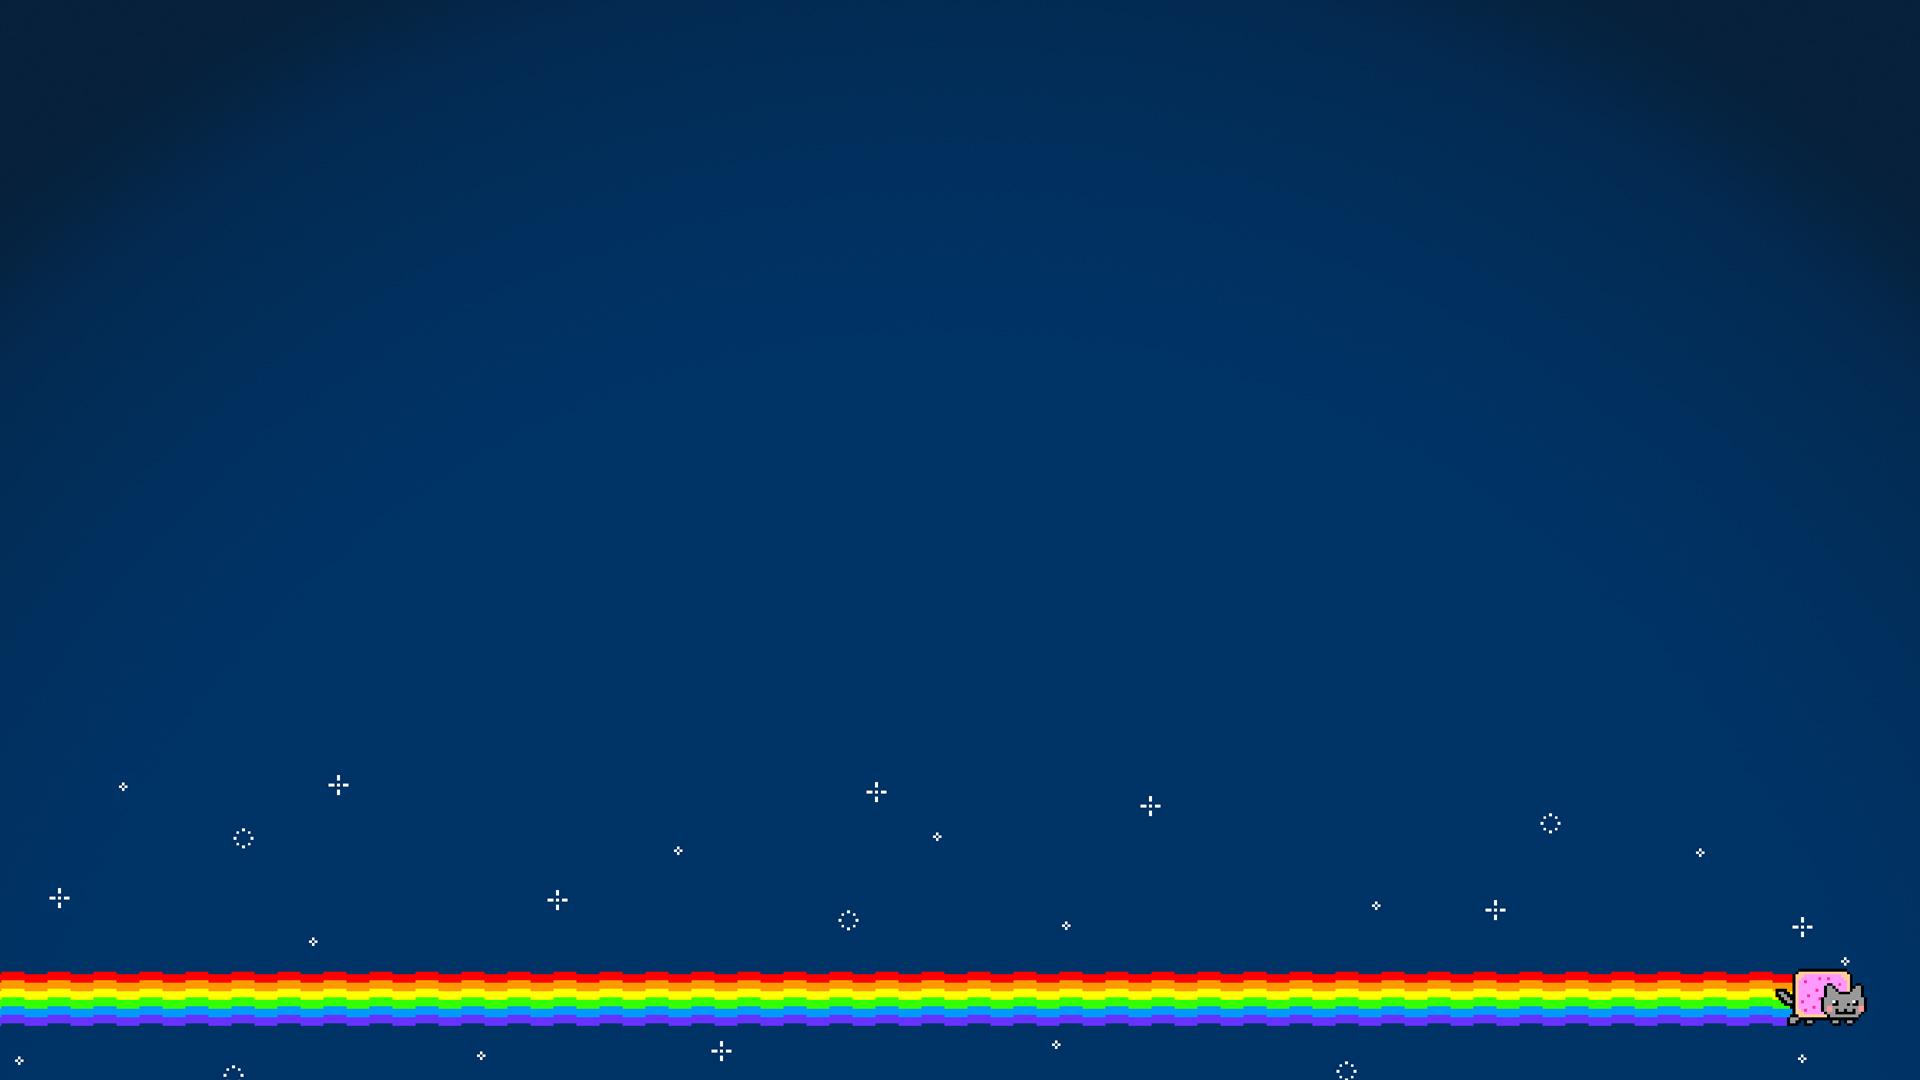 Nyan Cat Wallpaper HD